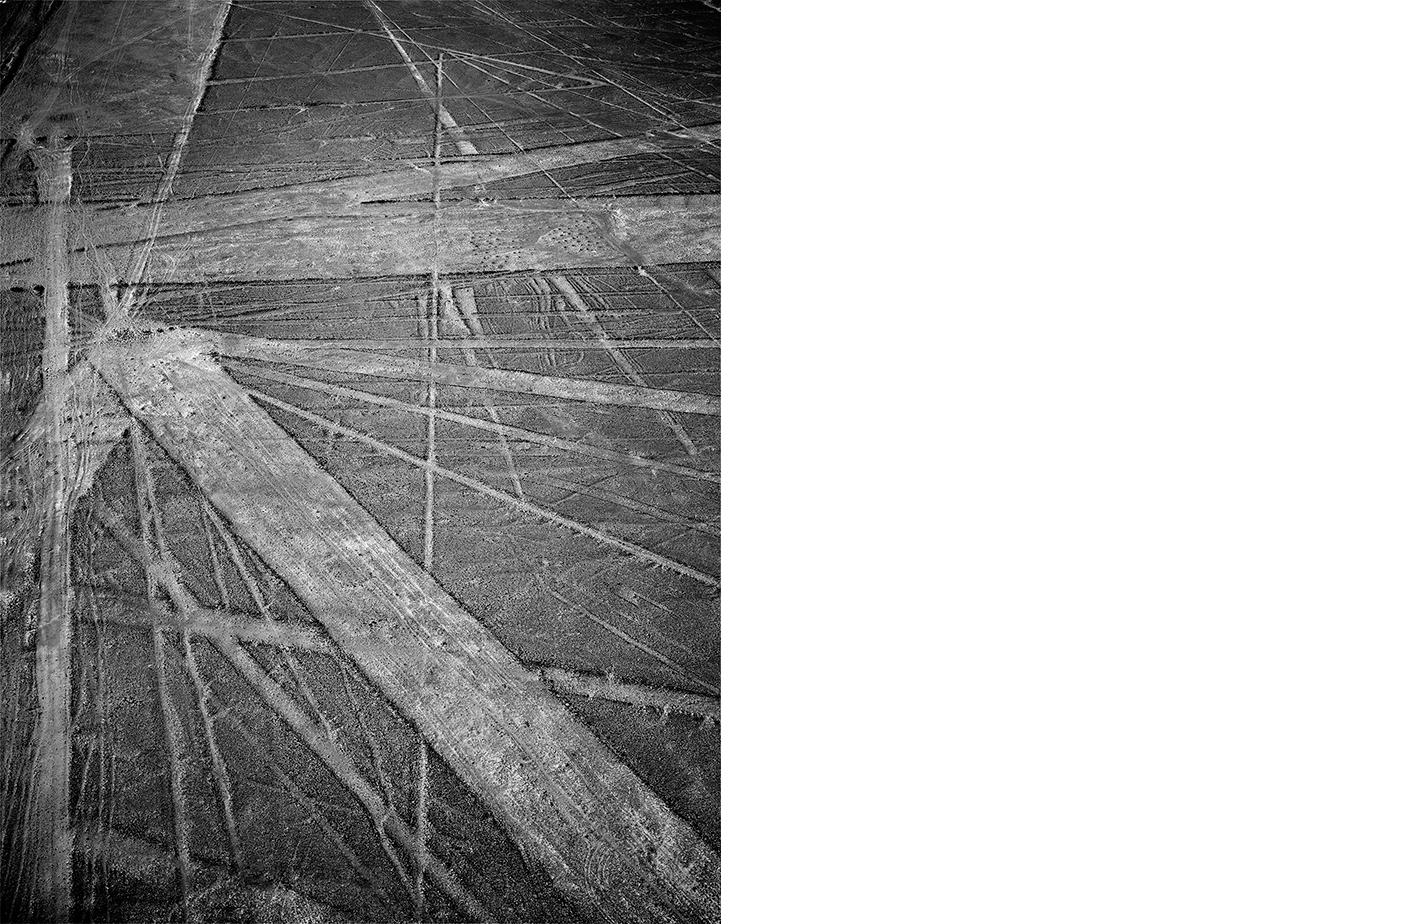 6752-01 Nasca #027  Platinum Palladium Print 12.46 x 16.00 inch Image Size 17.00 x 22.00 Paper Size 1 BAT / 1 PP /2 AP / 6 EDP